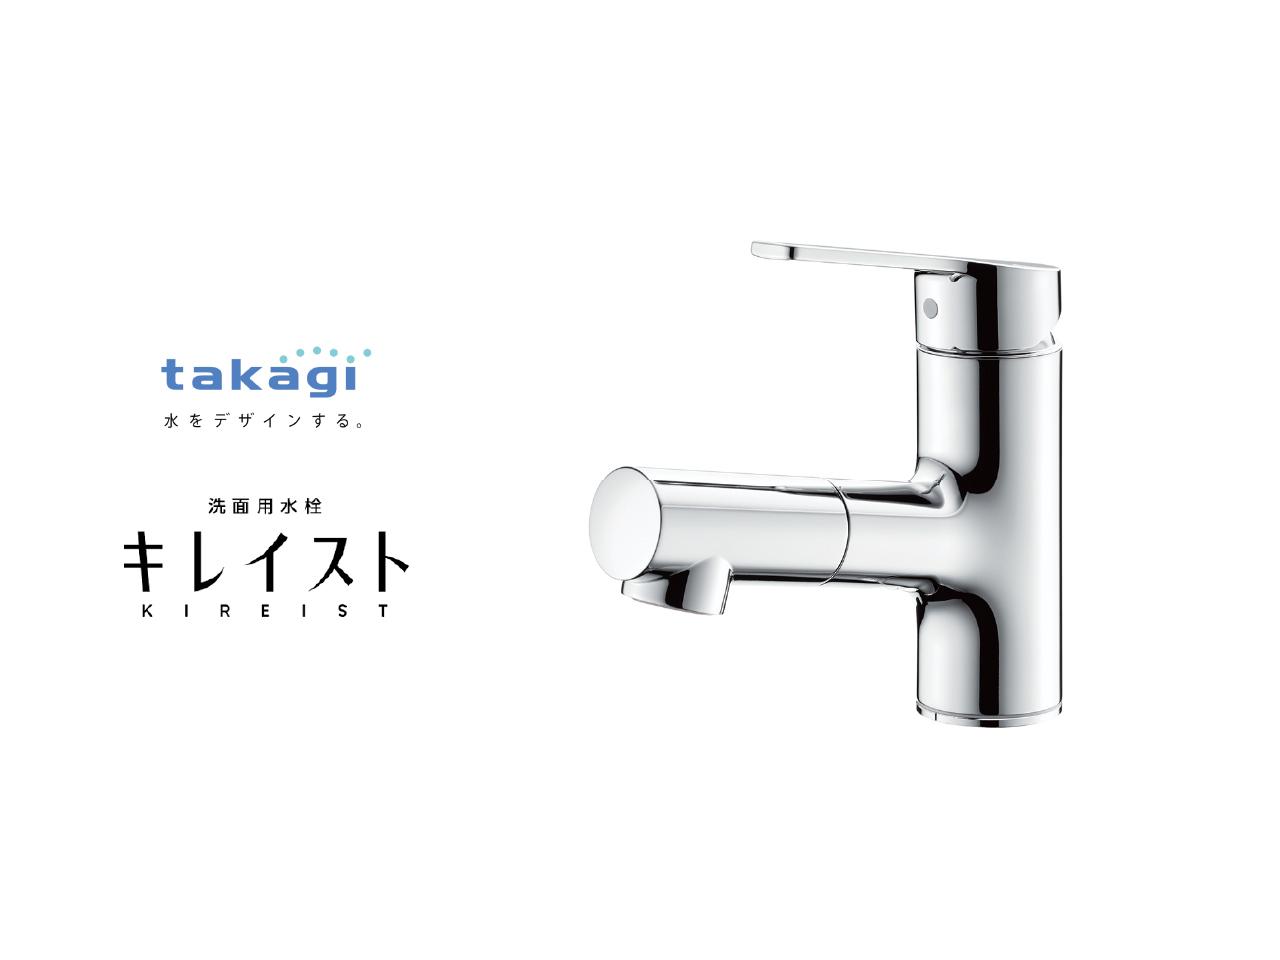 画像:洗面用水栓 takagi